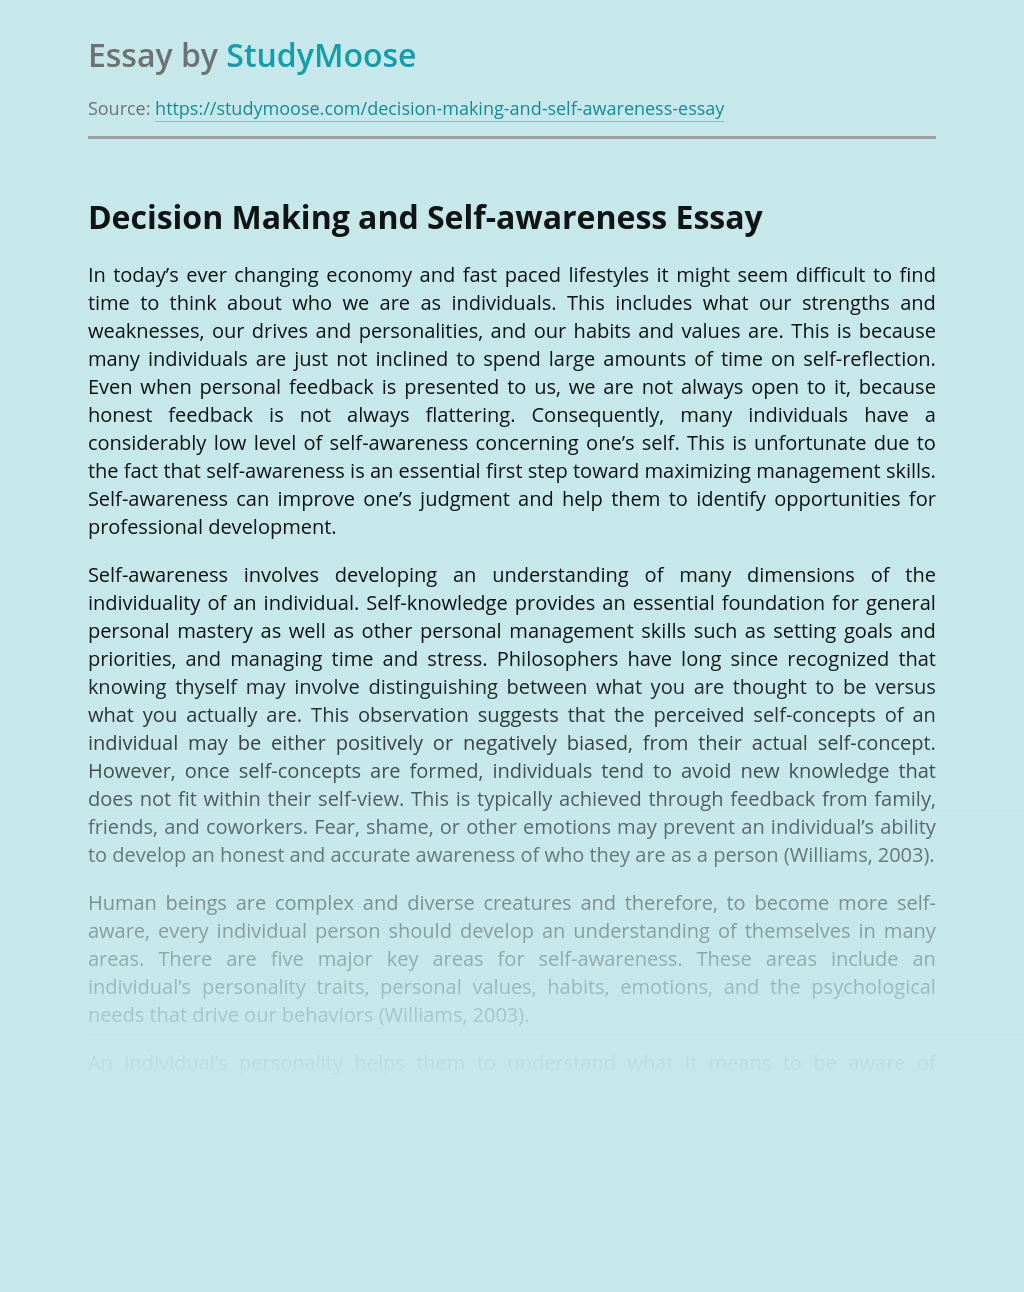 Decision Making and Self-awareness